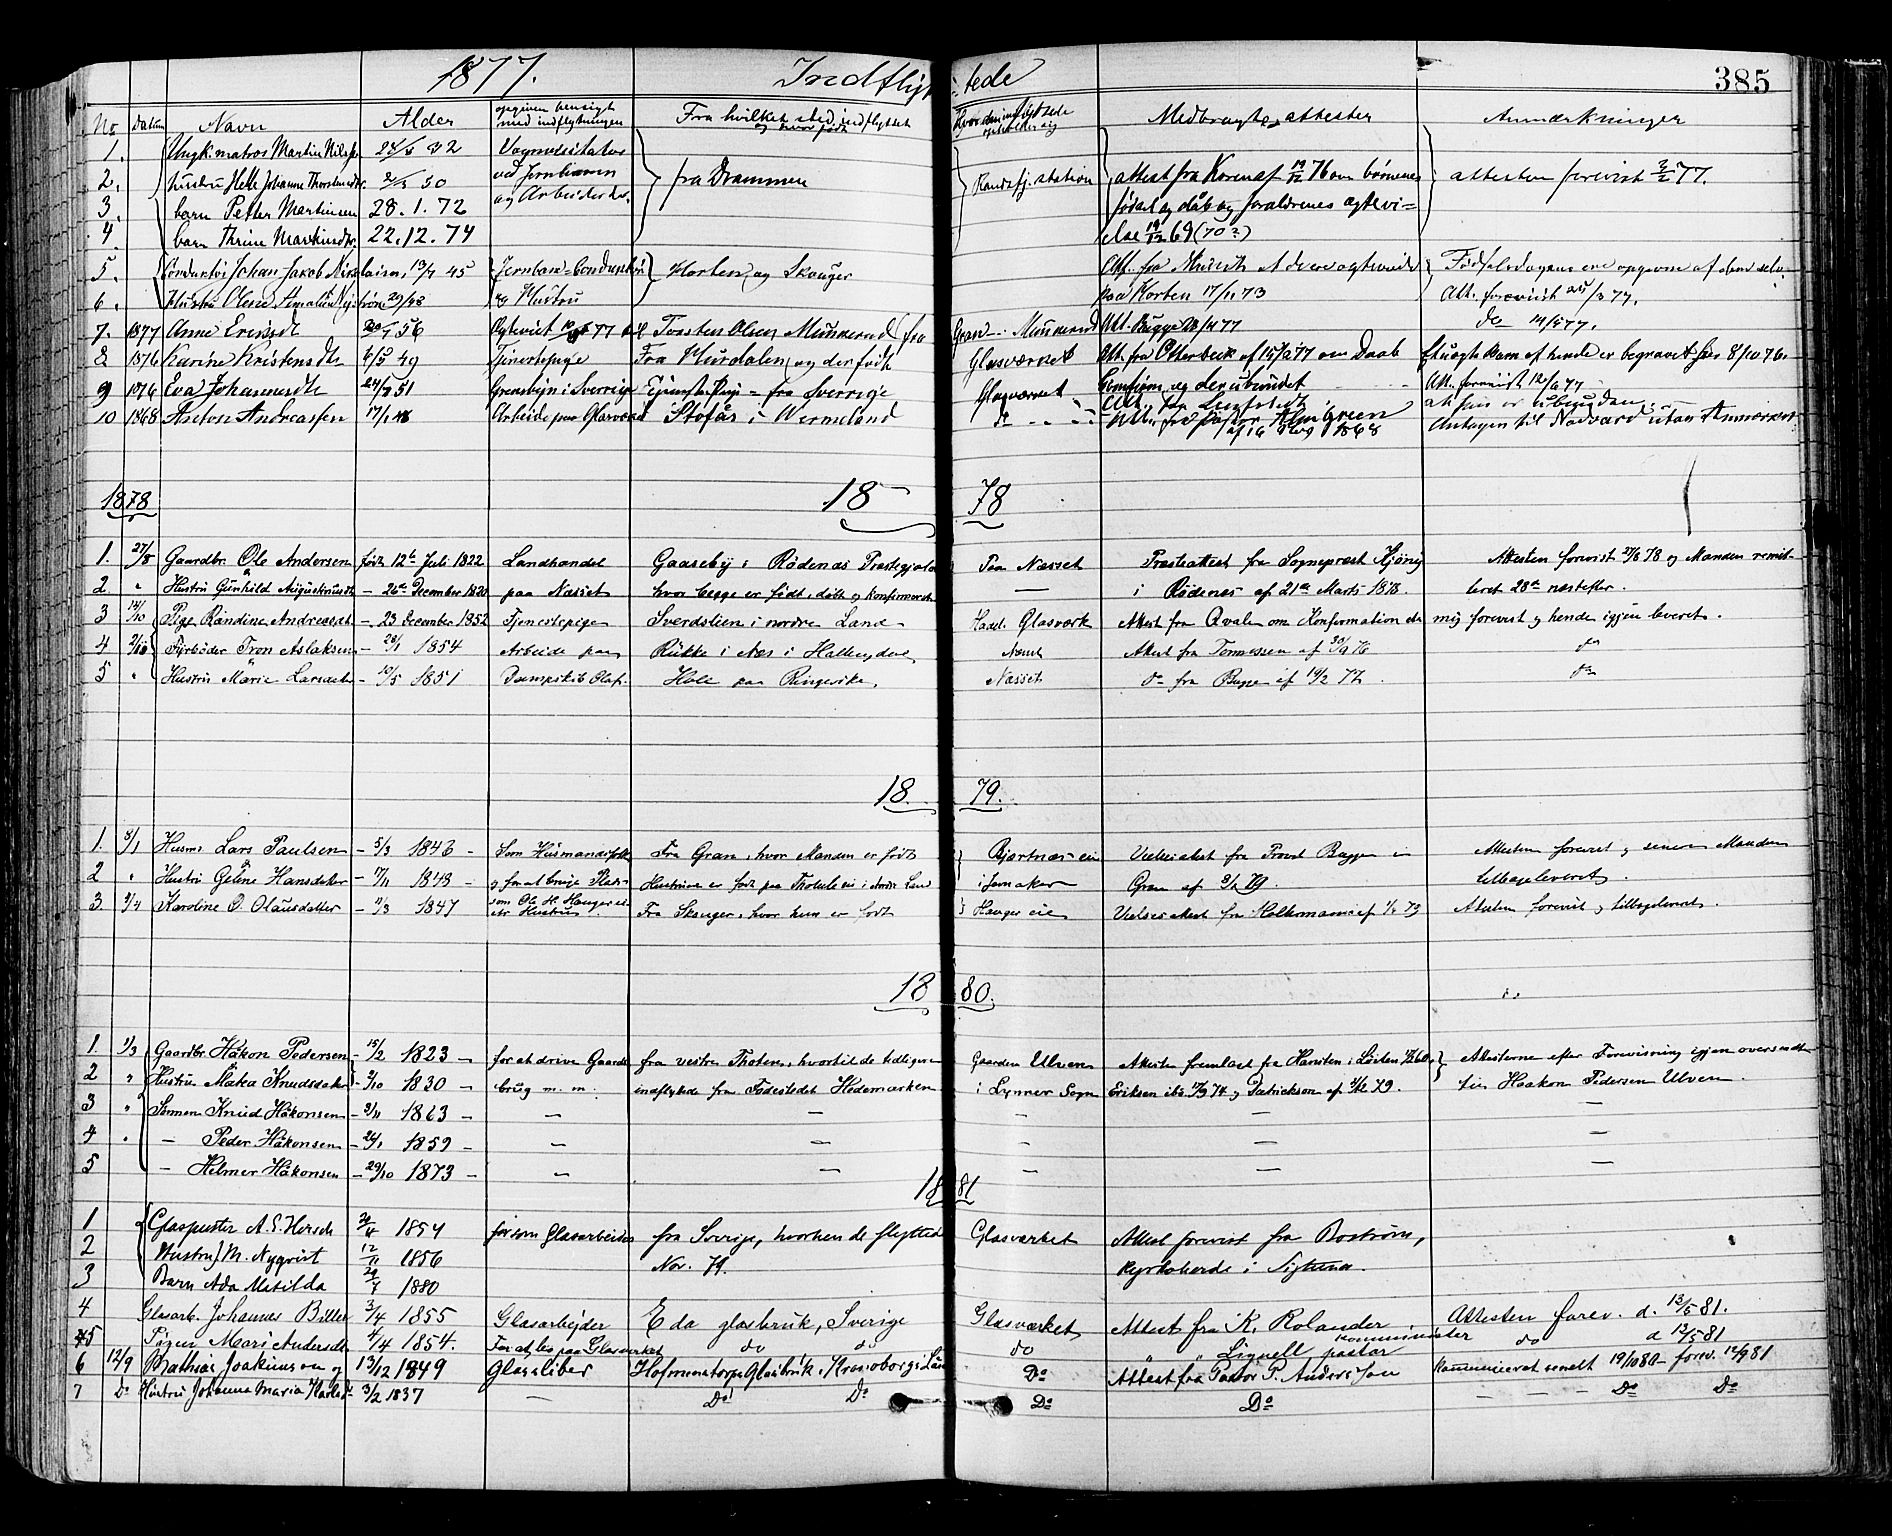 SAH, Jevnaker prestekontor, Ministerialbok nr. 8, 1877-1890, s. 385